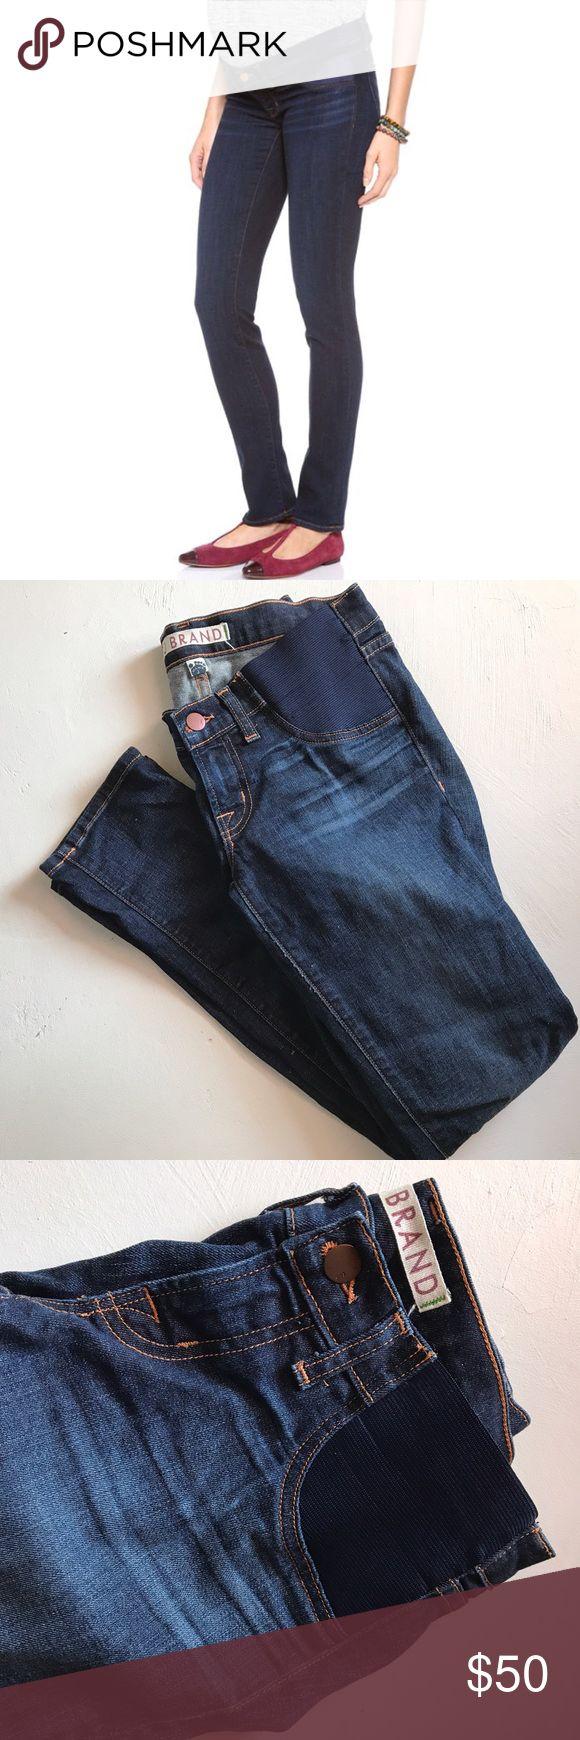 "J brand Mama J Jeans J Brand Mama J straight jeans in dark vintage wash. 29"" inseam. Size 26. J Brand Jeans"